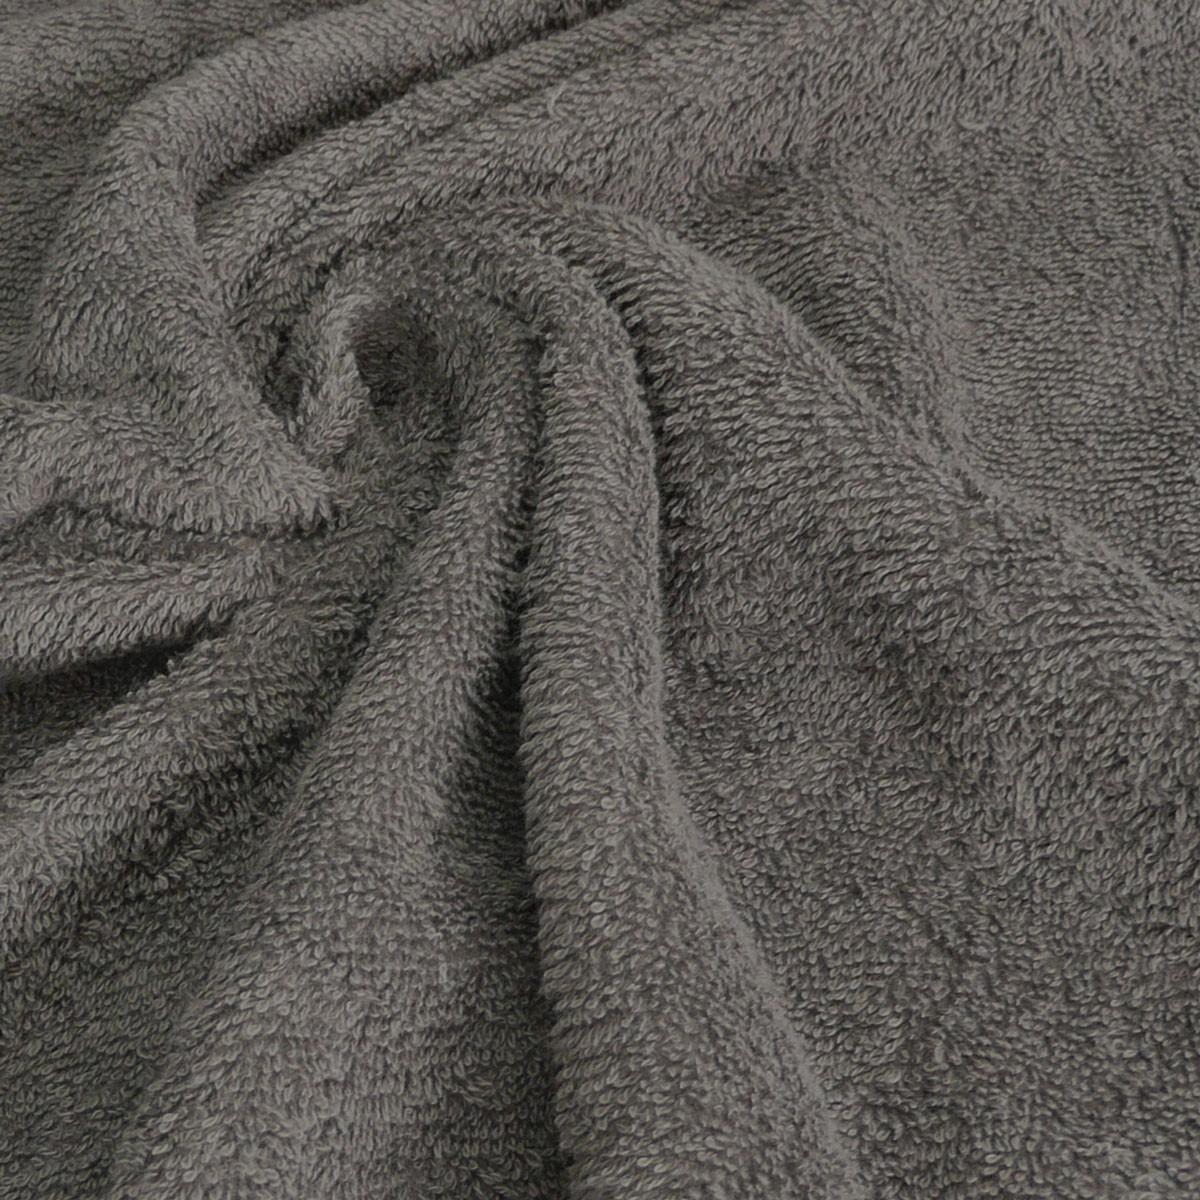 Frottee Handtuch Stoff Meterware dunkelgrau